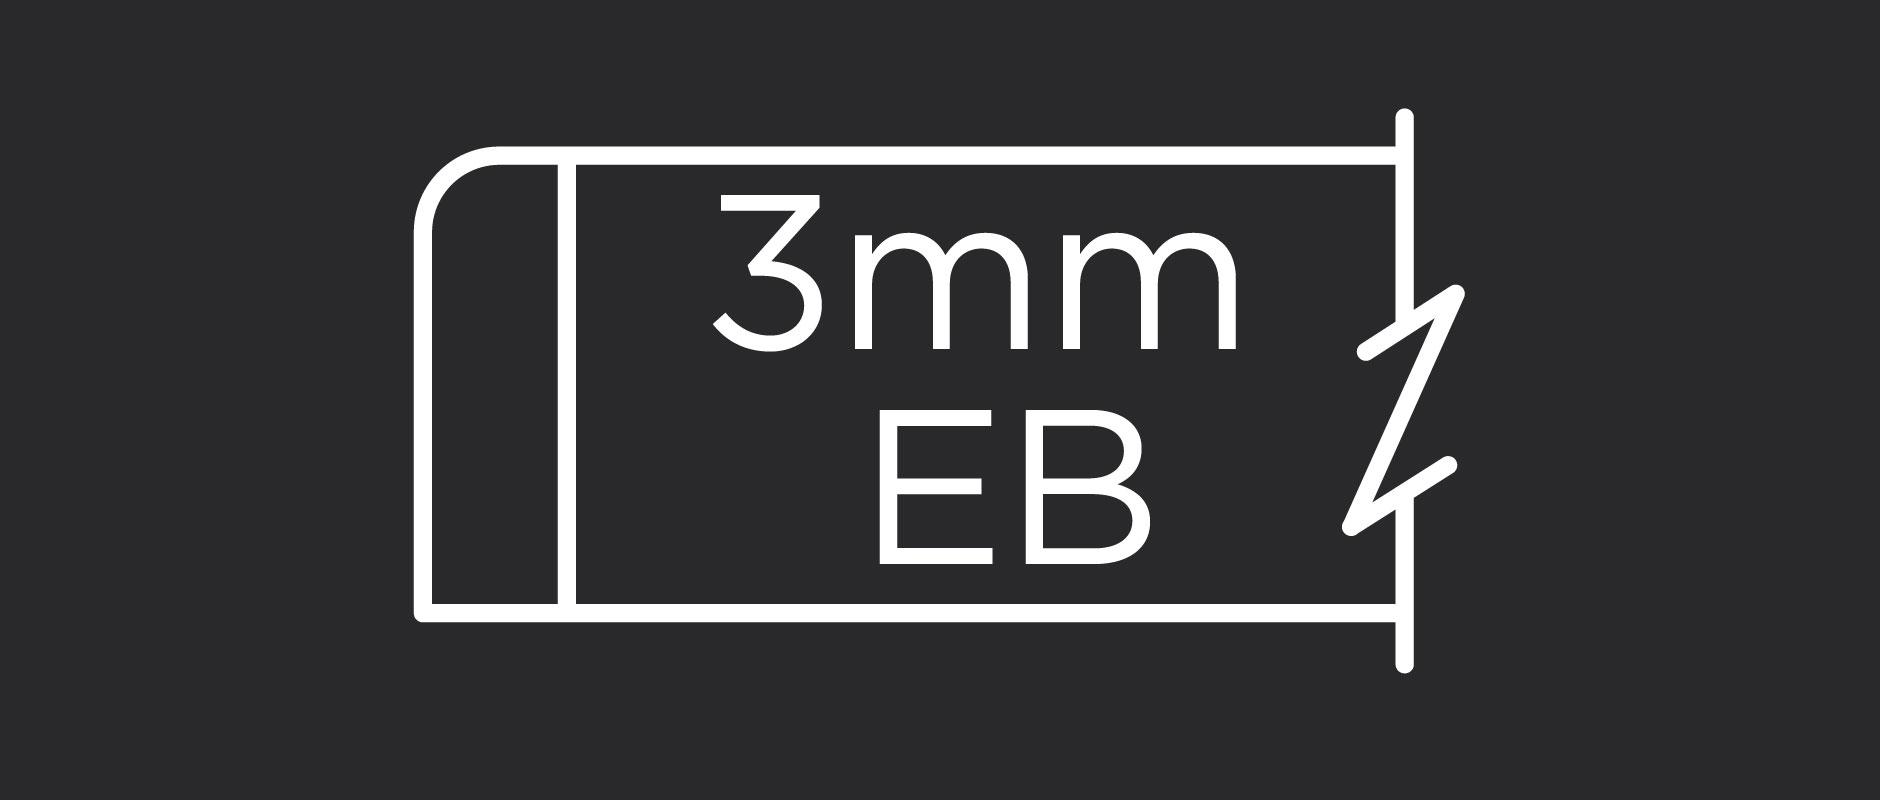 3mm edgeband profile for veneer